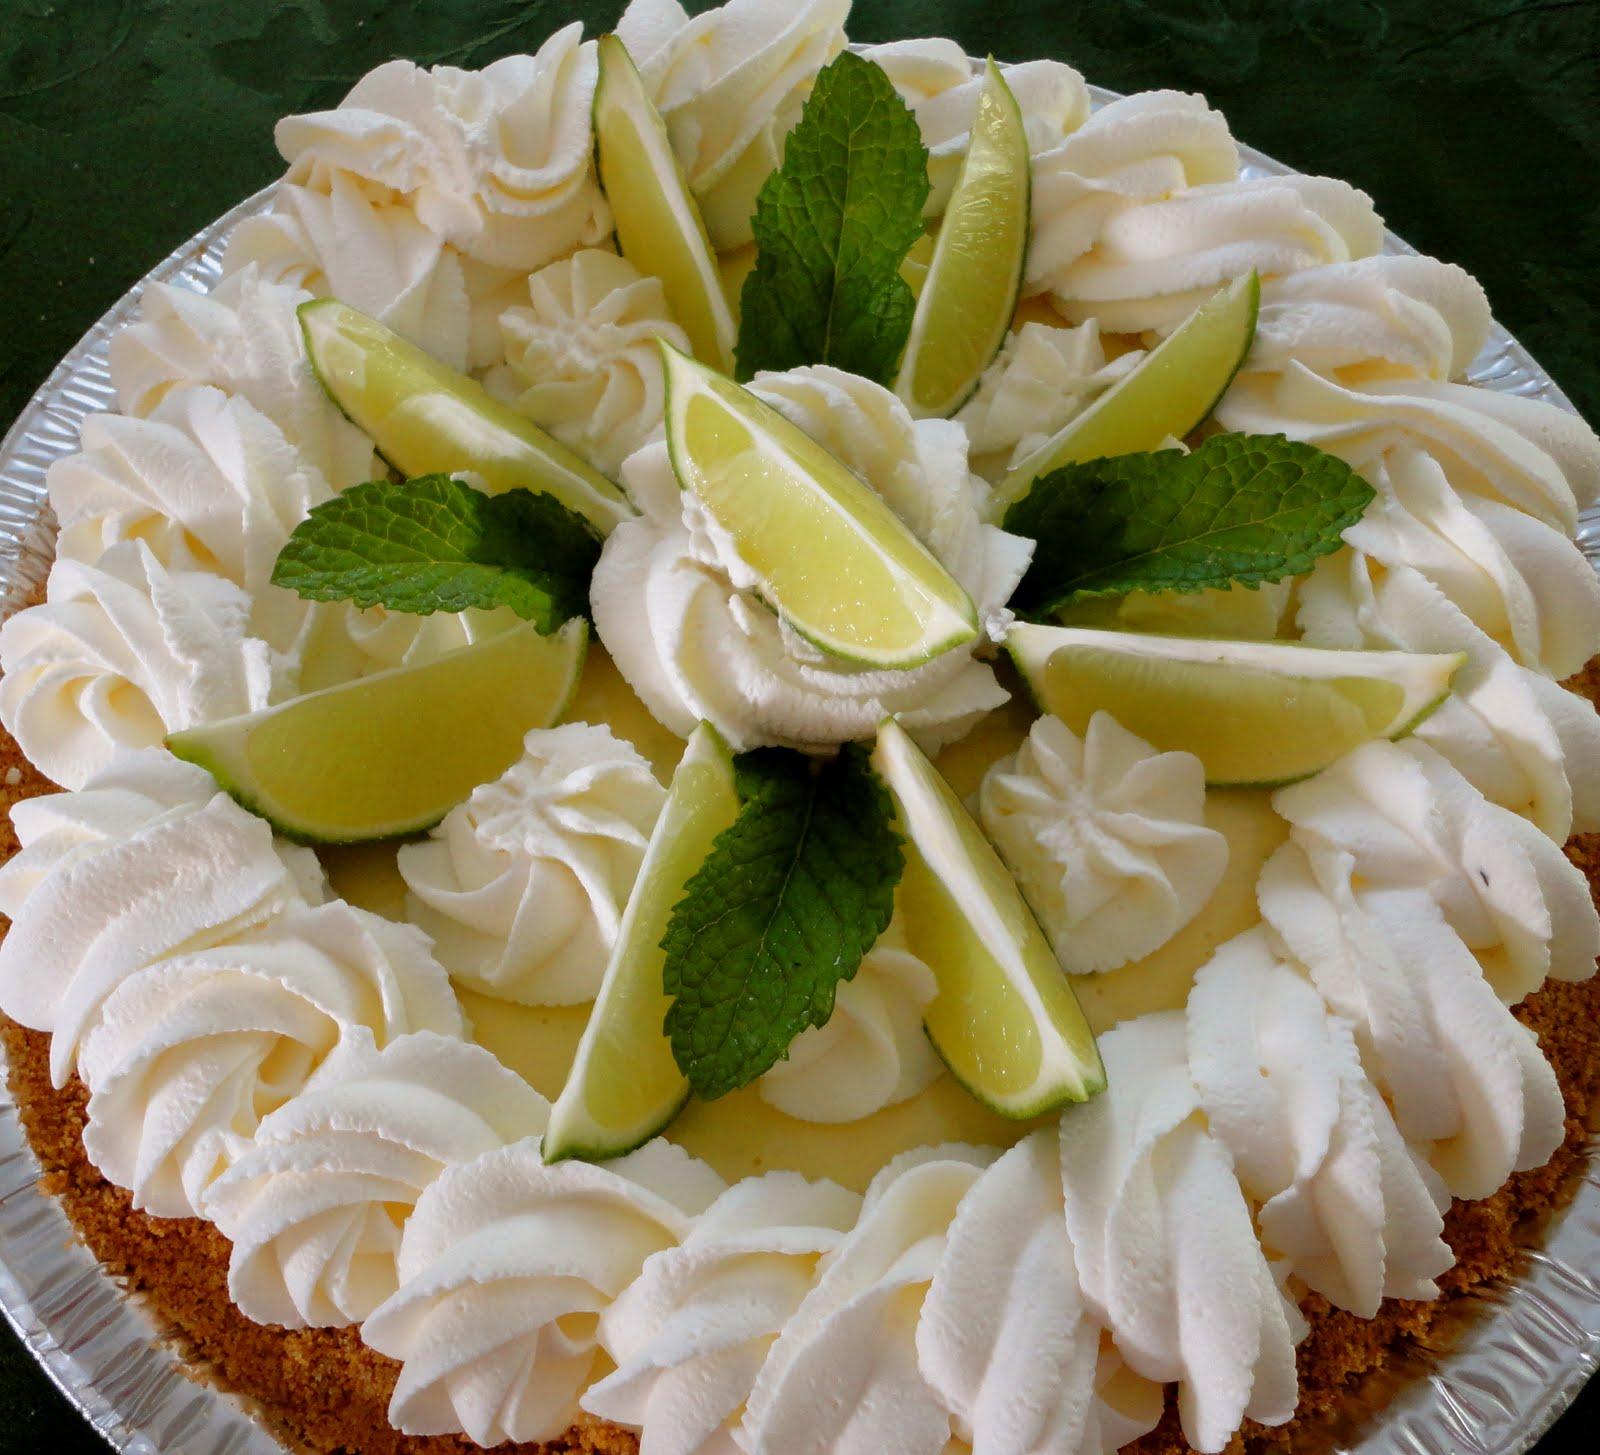 Frozen Key Lime Pie forecast